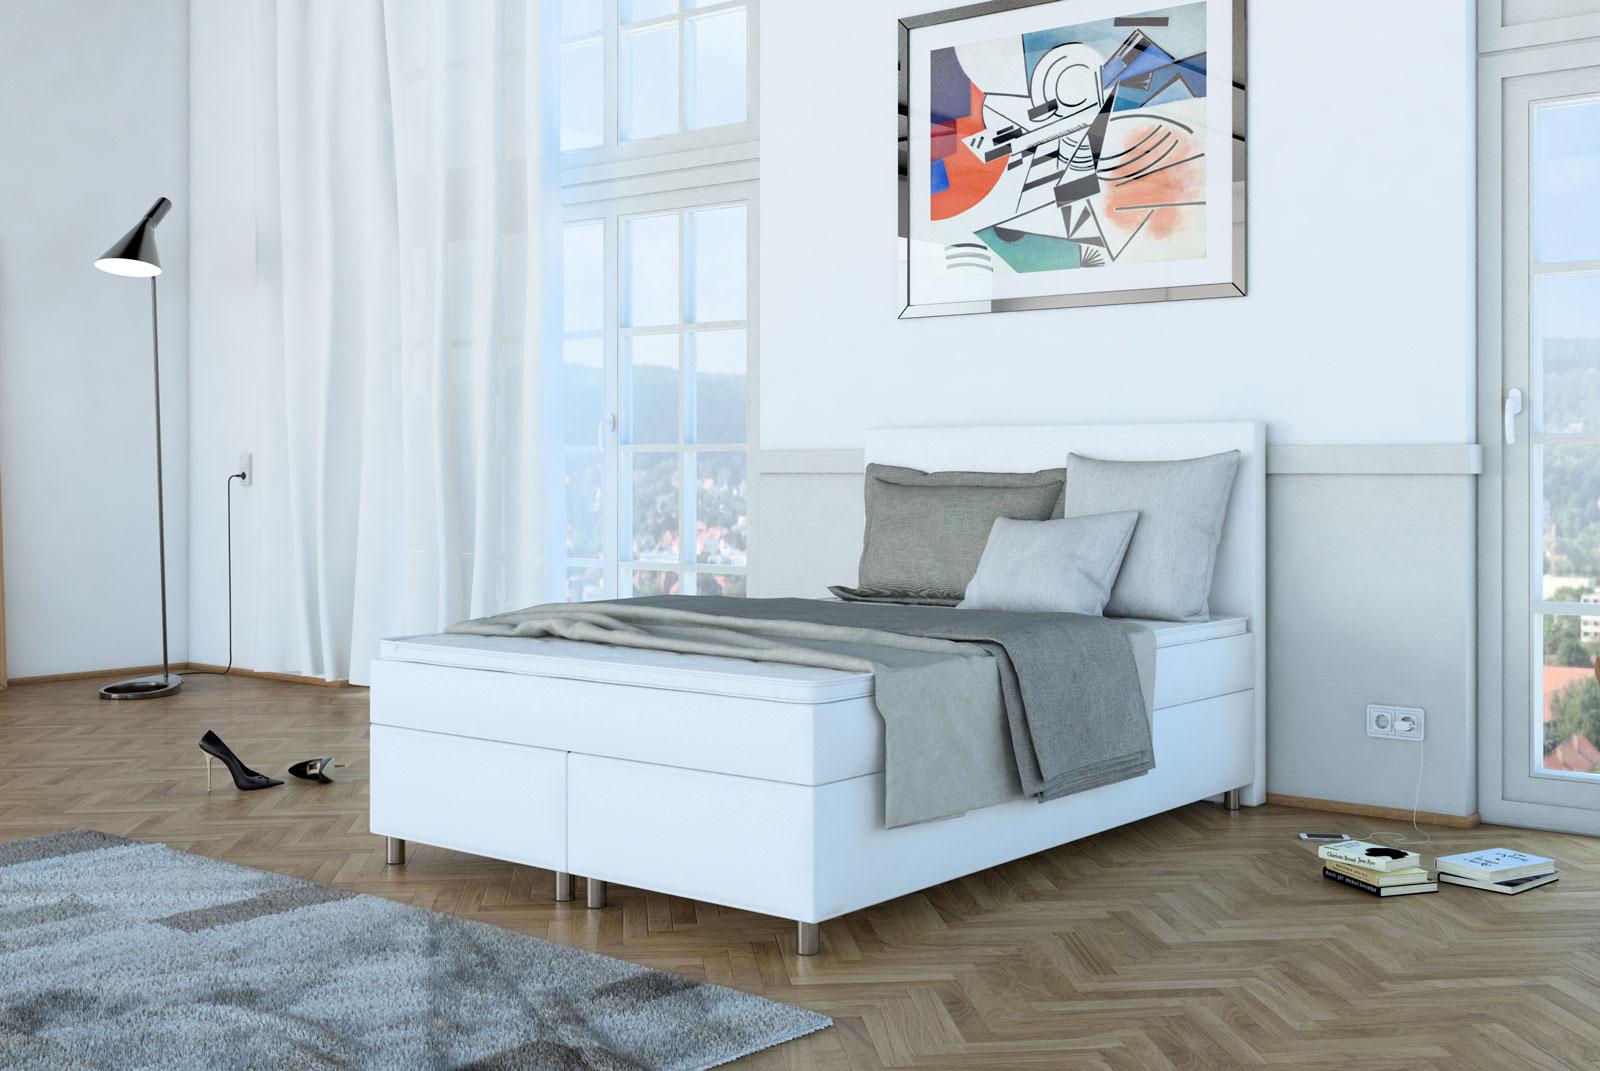 sam boxspringbett hotelbett 140 x 200 cm wei neo. Black Bedroom Furniture Sets. Home Design Ideas